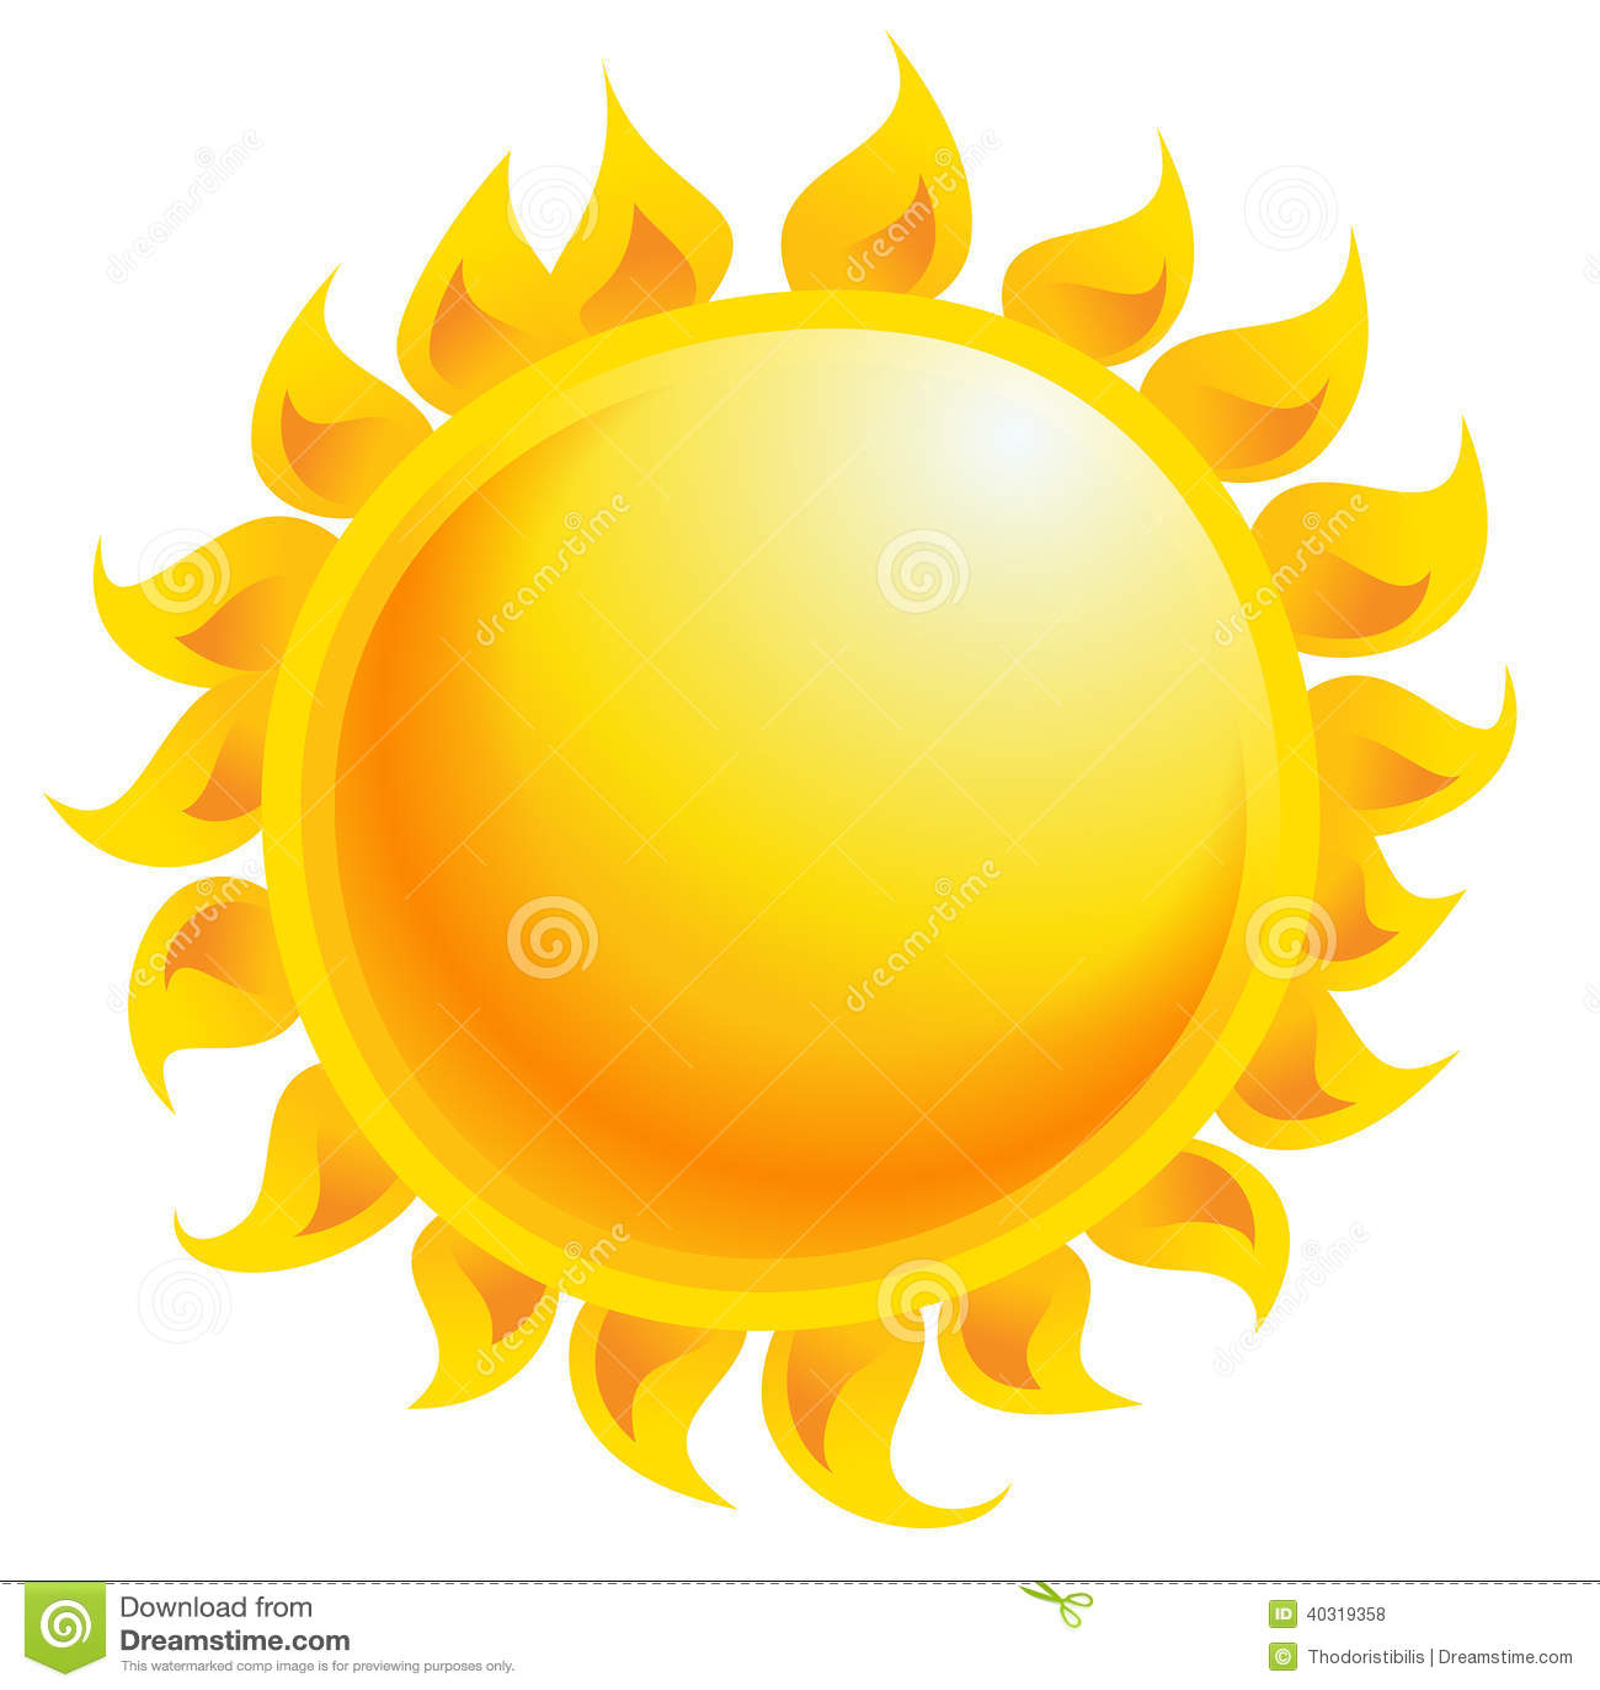 Yellow Cartoon Vector Sun Shining Isolated In White